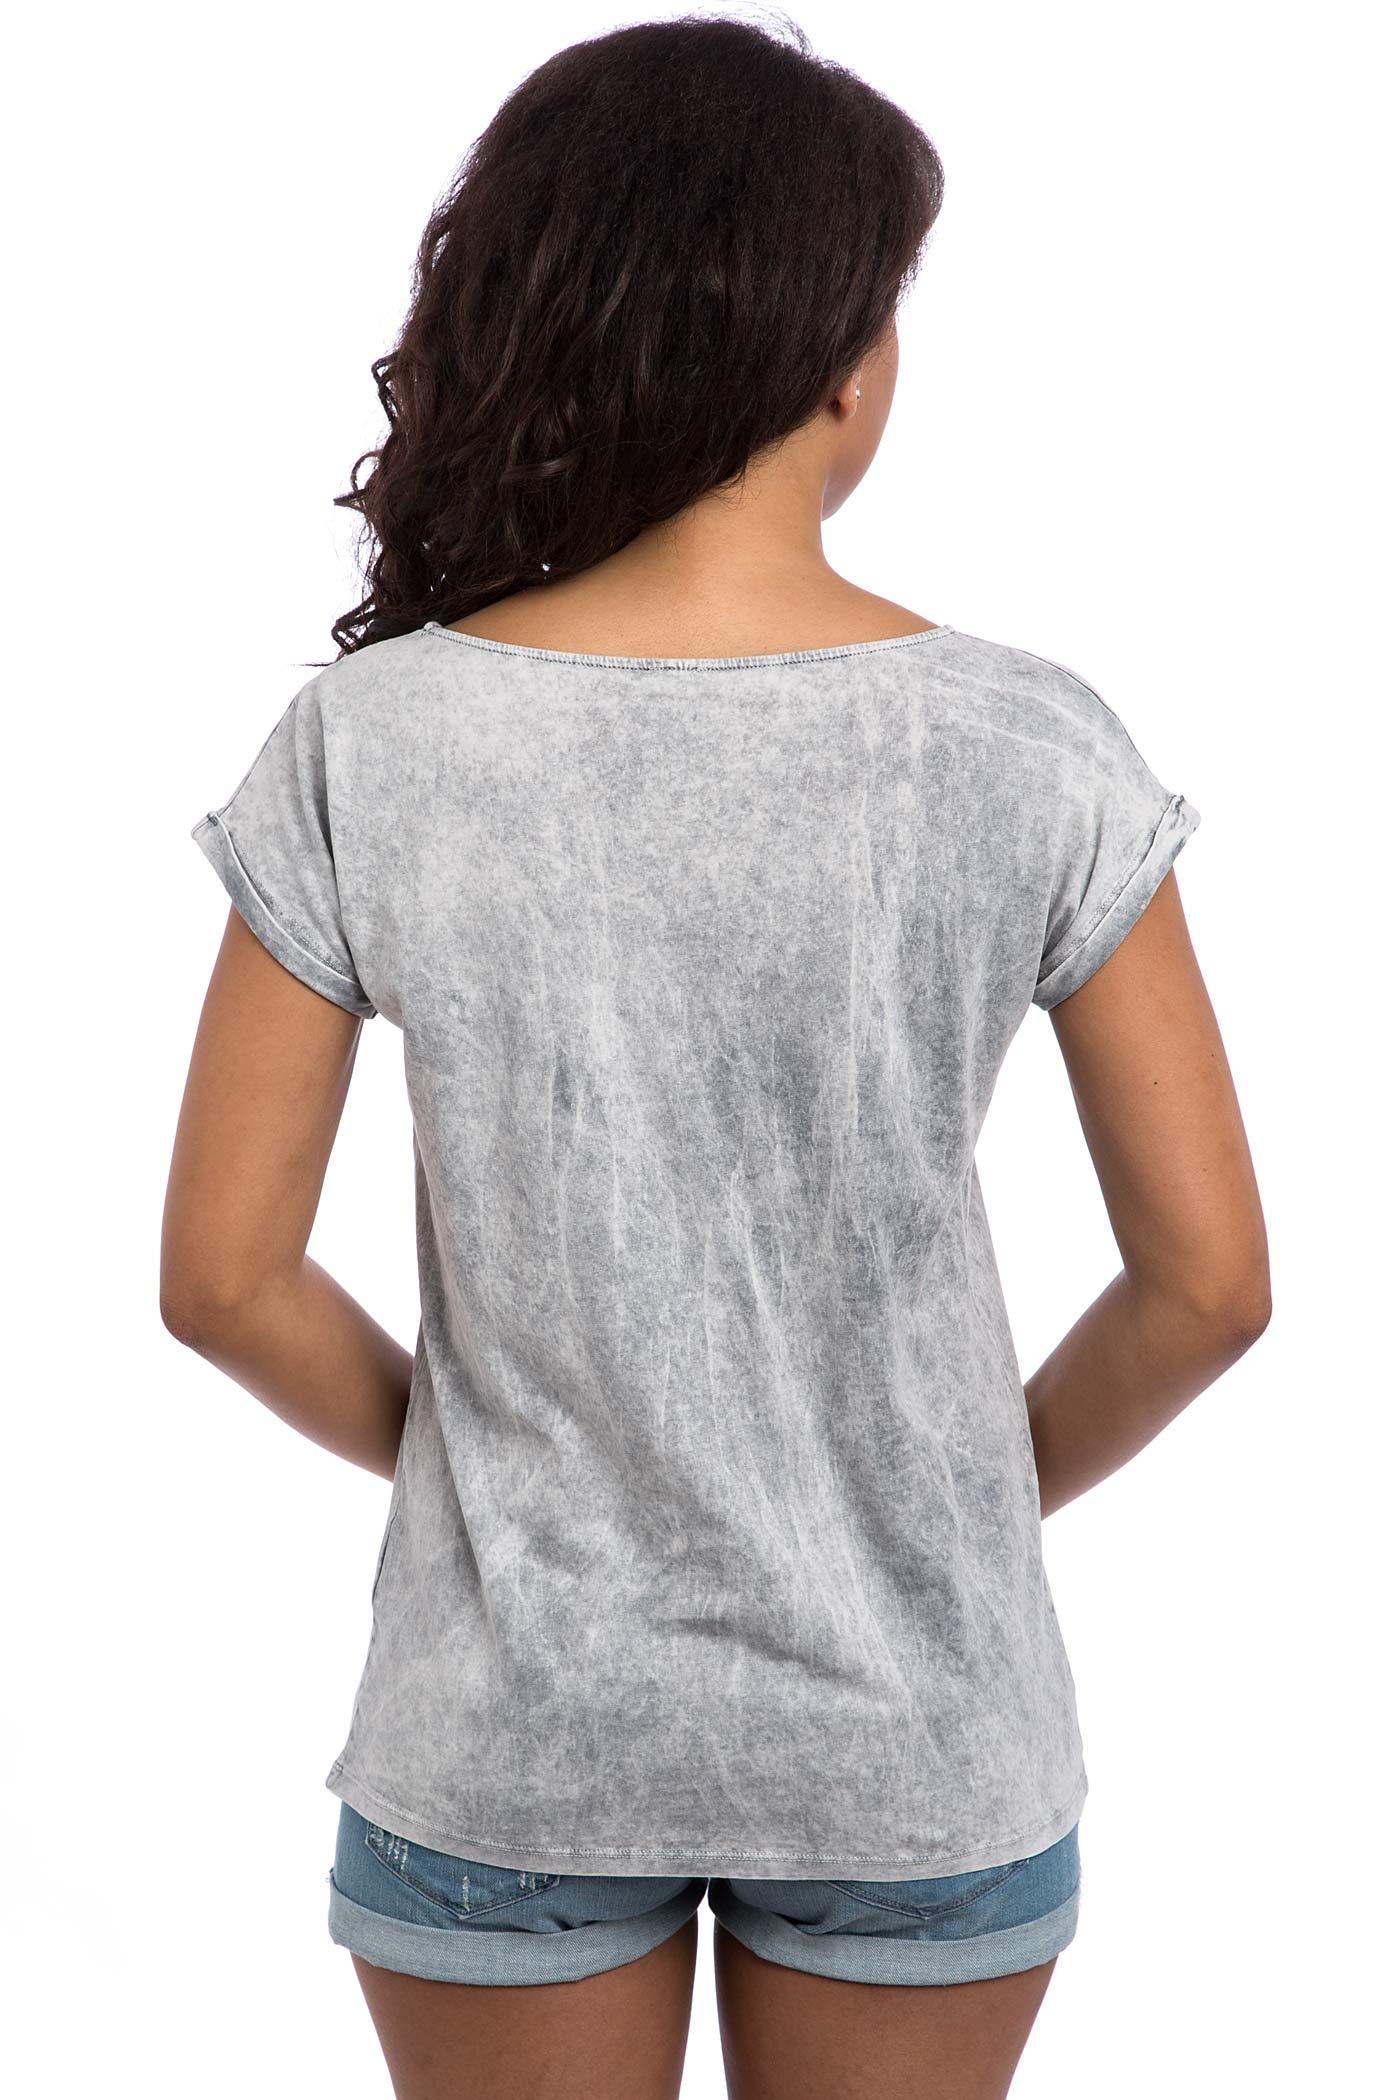 iriedaily vintage loose t shirt women light grey buy at. Black Bedroom Furniture Sets. Home Design Ideas